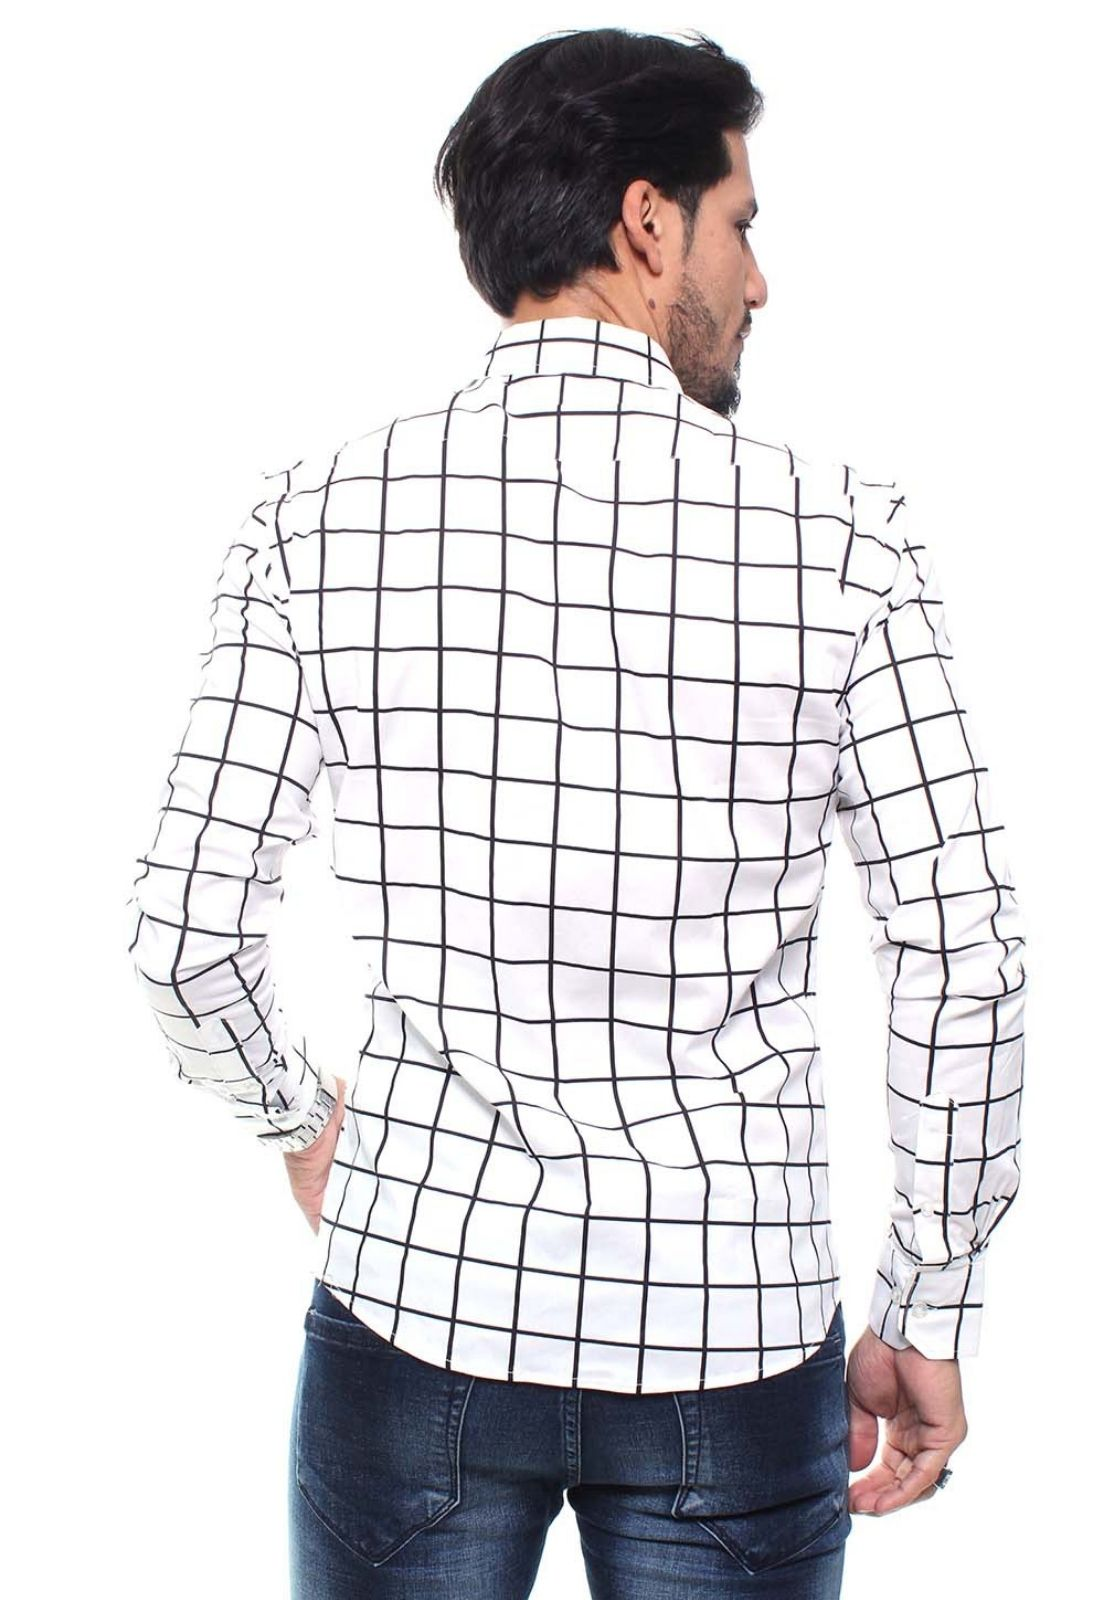 Kit 3 Camisas Masculina Manga Longa Crocker - 47188/47156/47158 Estampas Variadas  - CROCKER JEANS